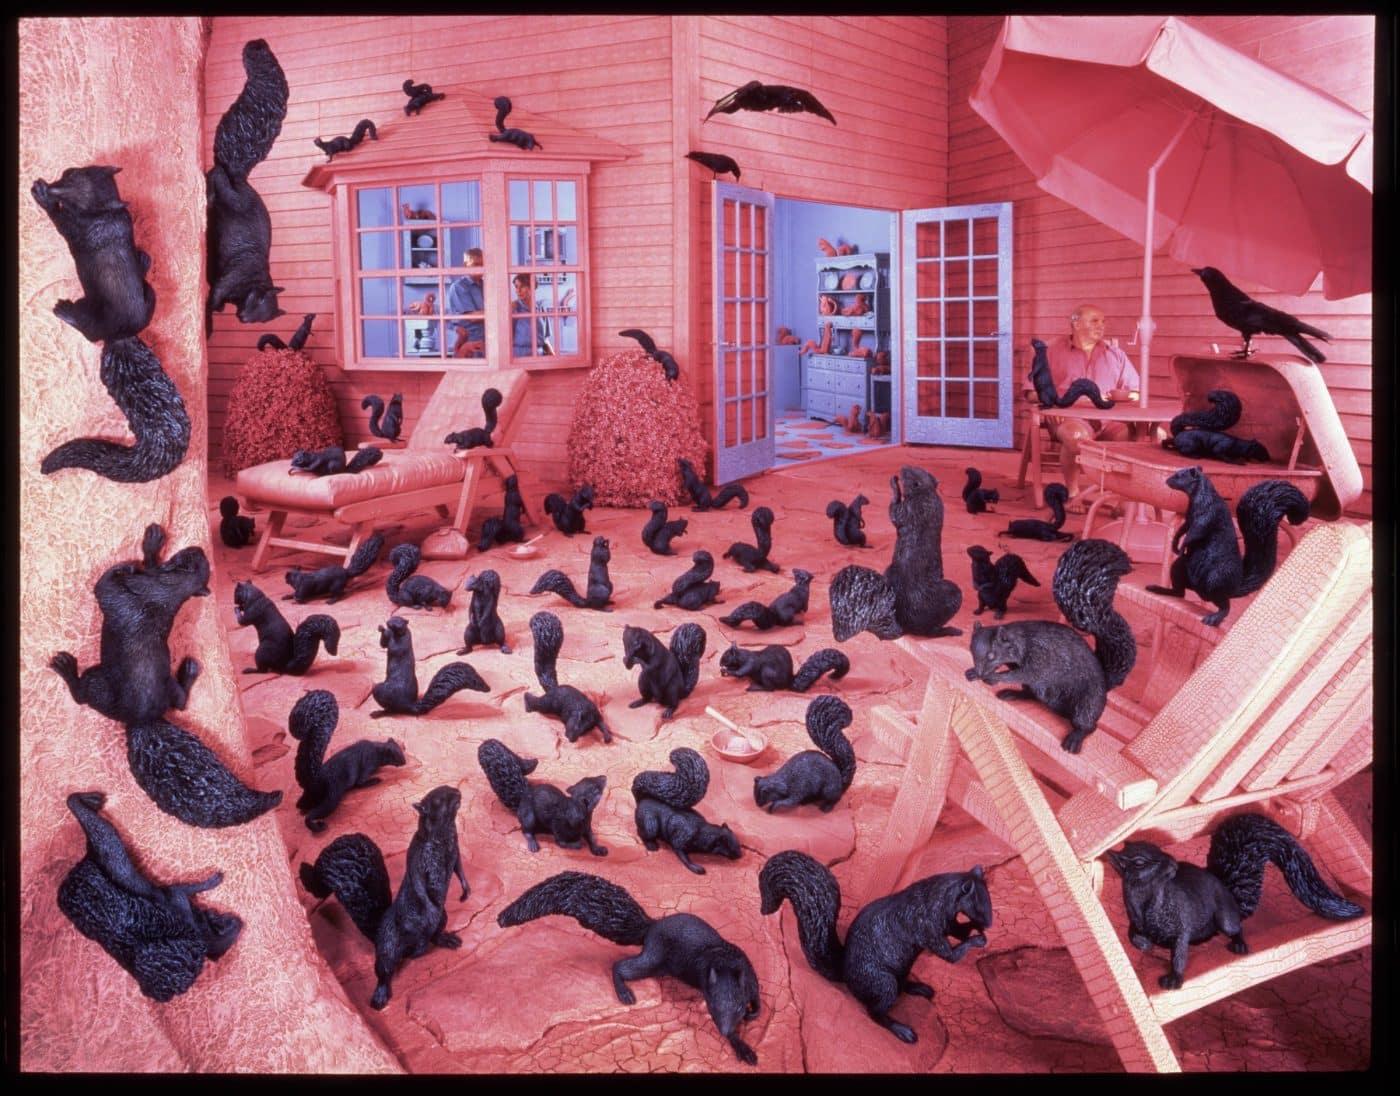 Gathering Paradise, 1991, by Sandy Skoglund